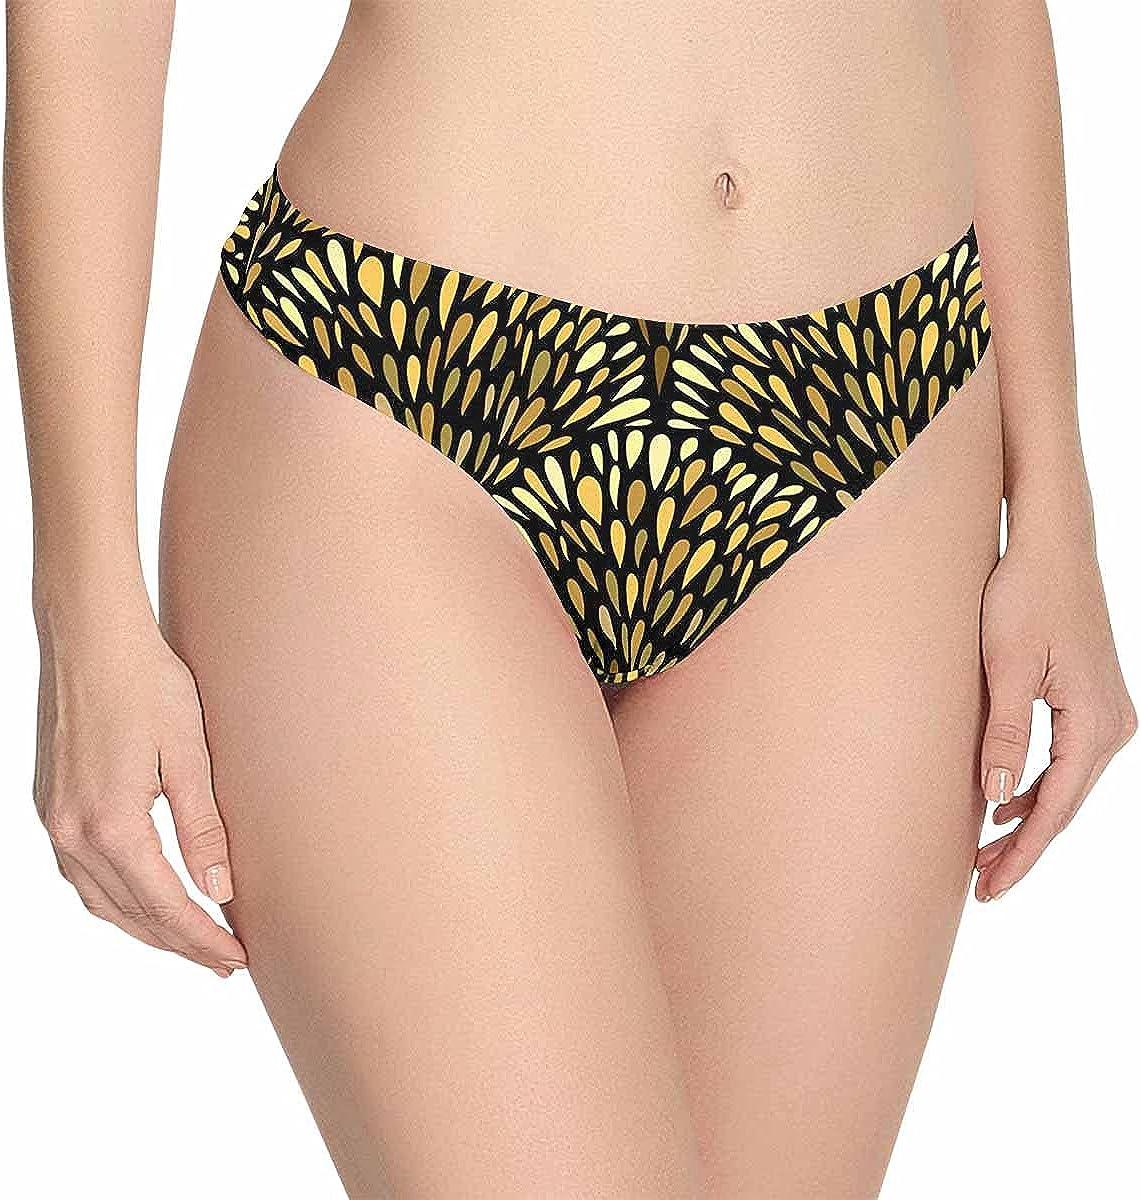 InterestPrint Women's Low Waist Breathable Pantie Deluxe Soft Underwear sold out